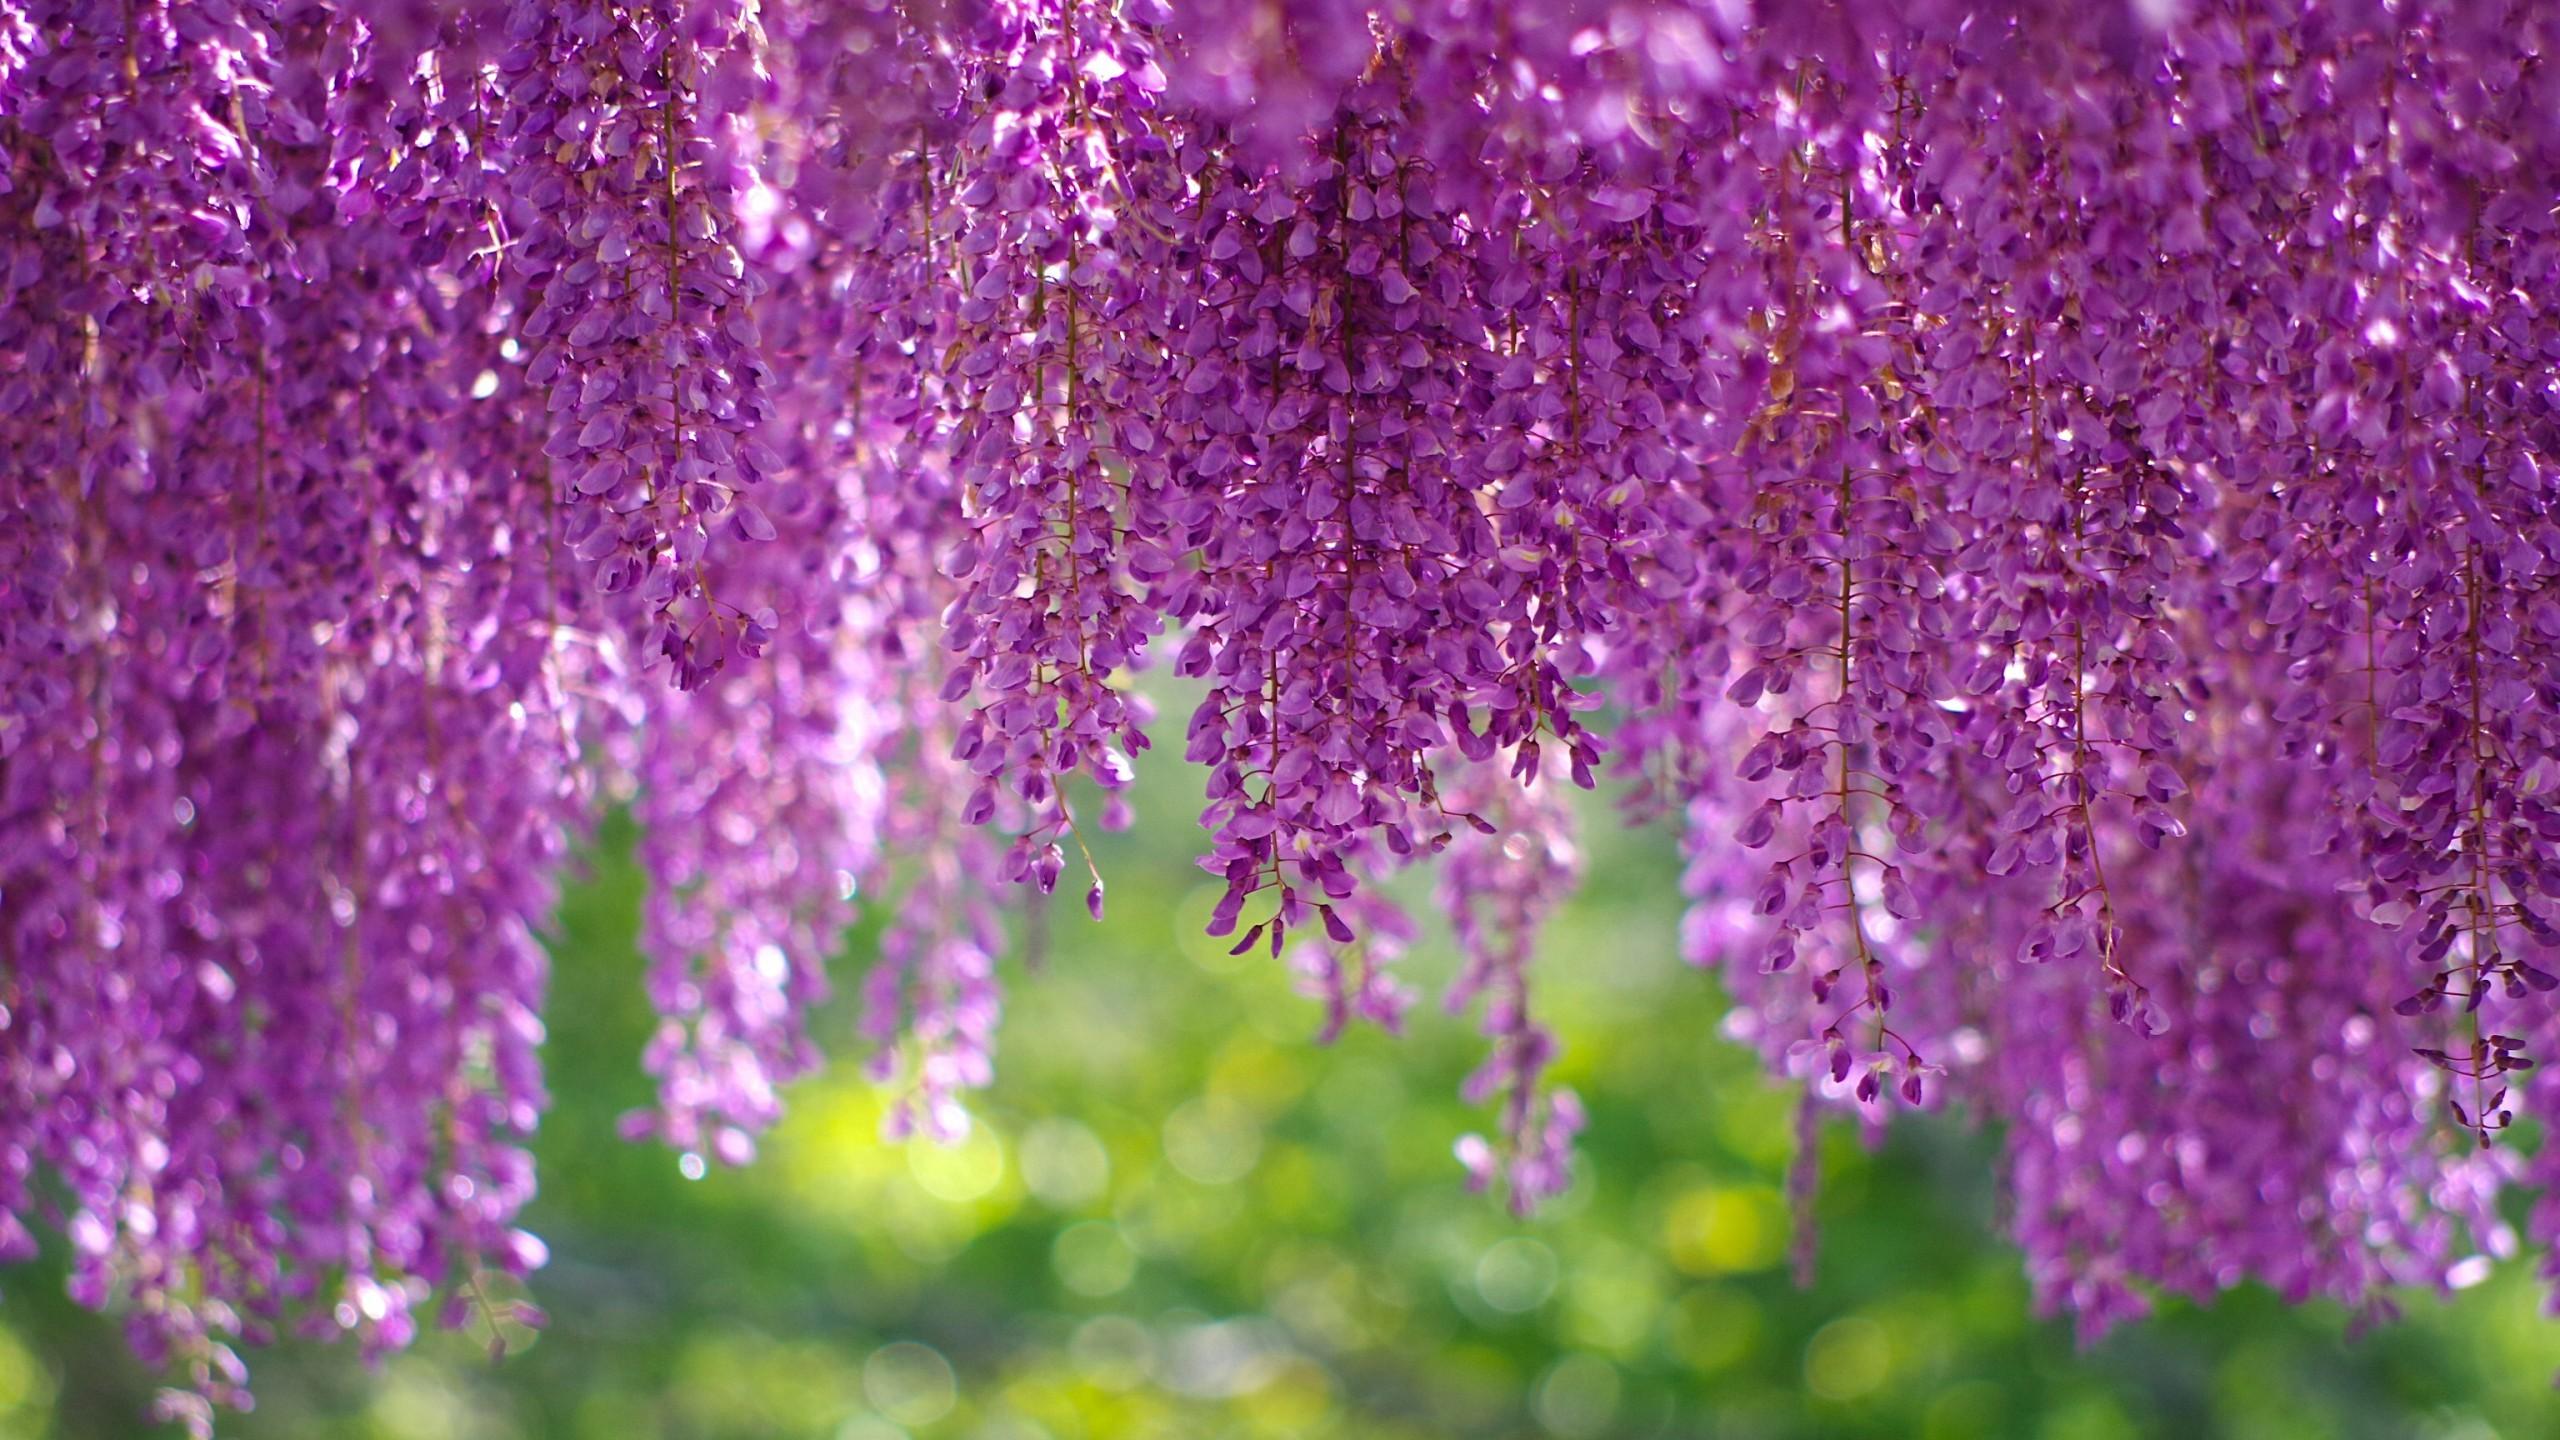 Flowers / Wisteria Wallpaper. Wisteria, Blossom, Purple, HD